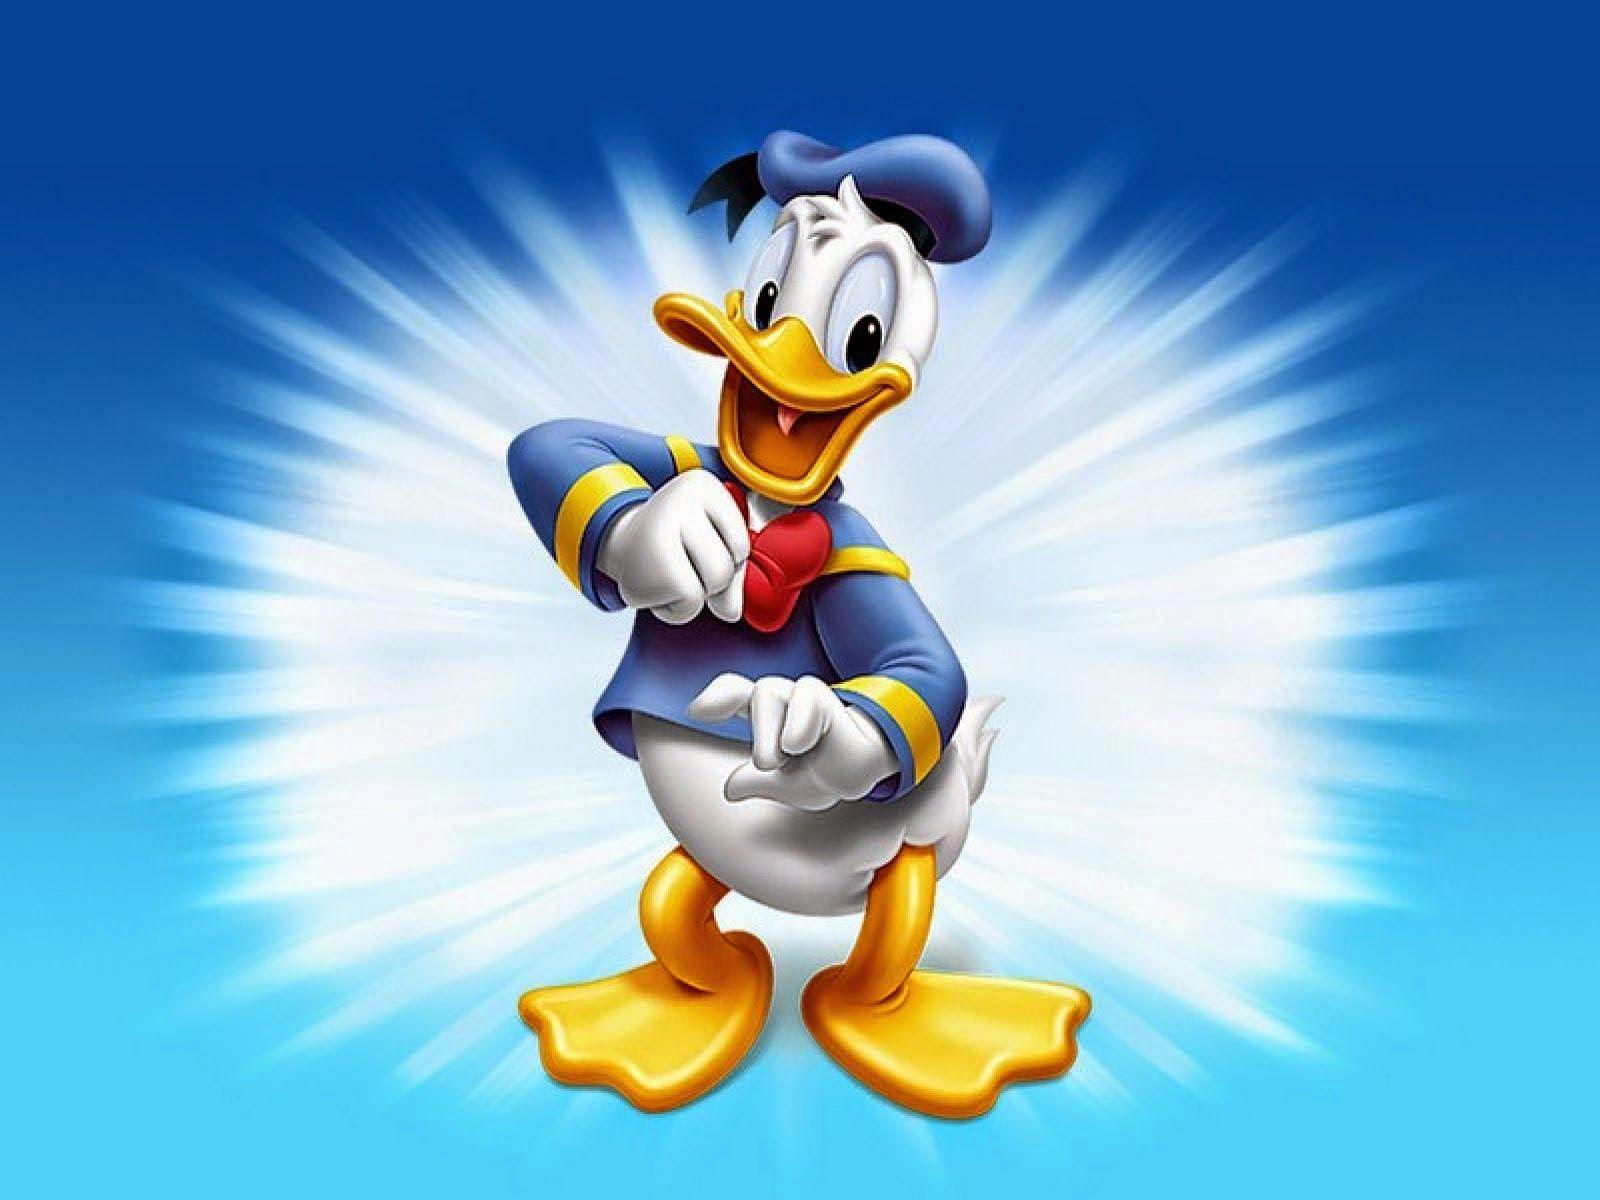 Donald Duck Cartoon Hd Desktop Background Wallpapers Pictures Download For Free Cartoon Wallpaper Funny Animated Cartoon Duck Cartoon